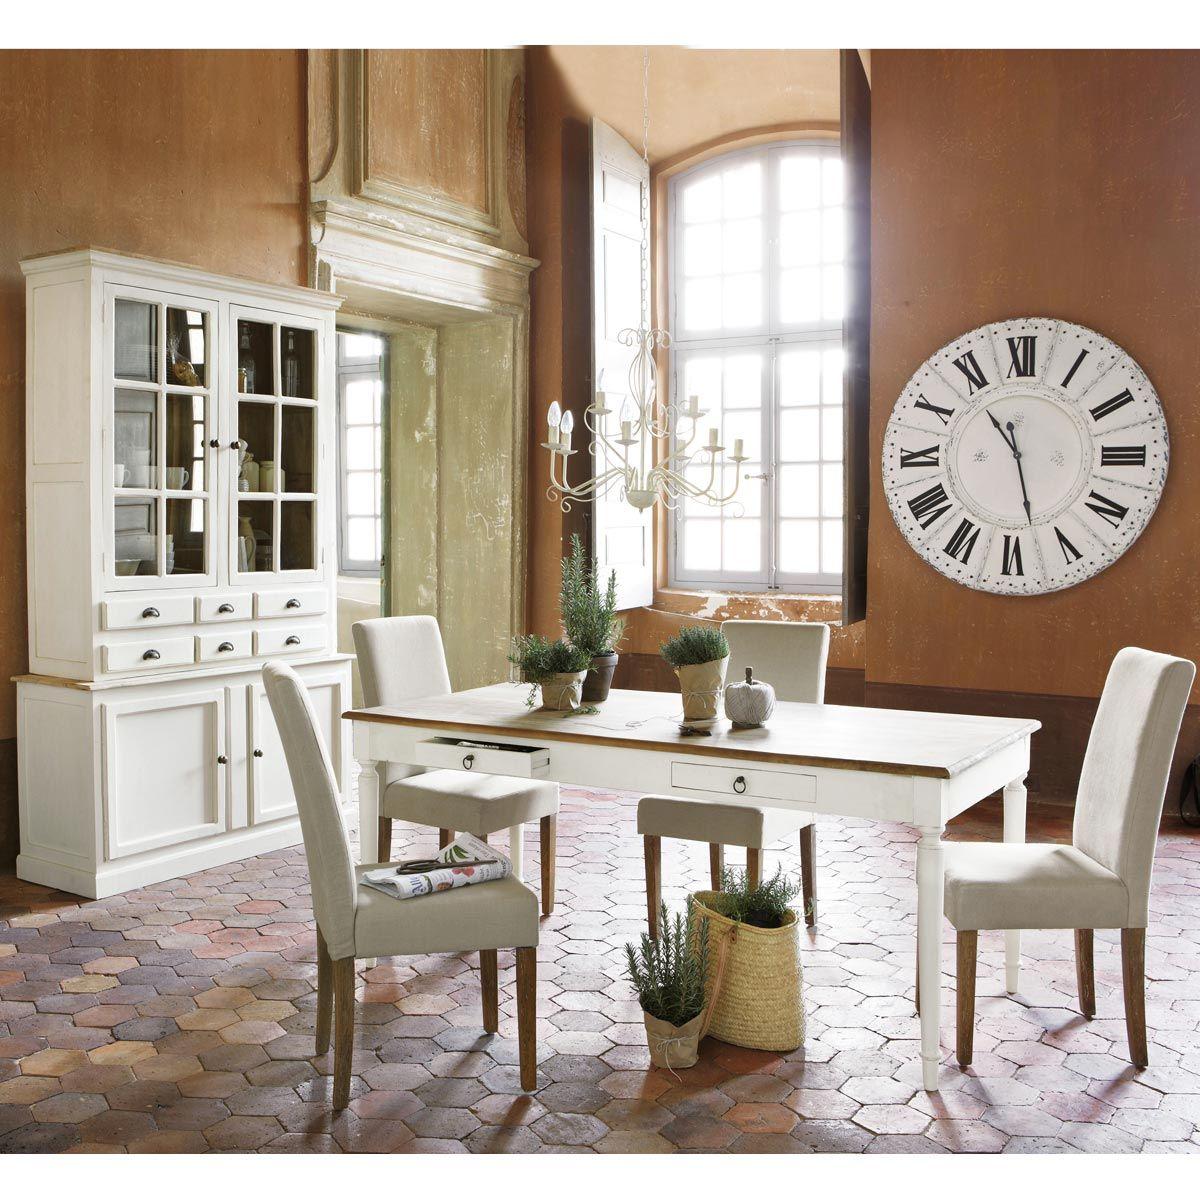 esstisch bergerac bergerac maisons du monde dining room pinterest credenza and room. Black Bedroom Furniture Sets. Home Design Ideas